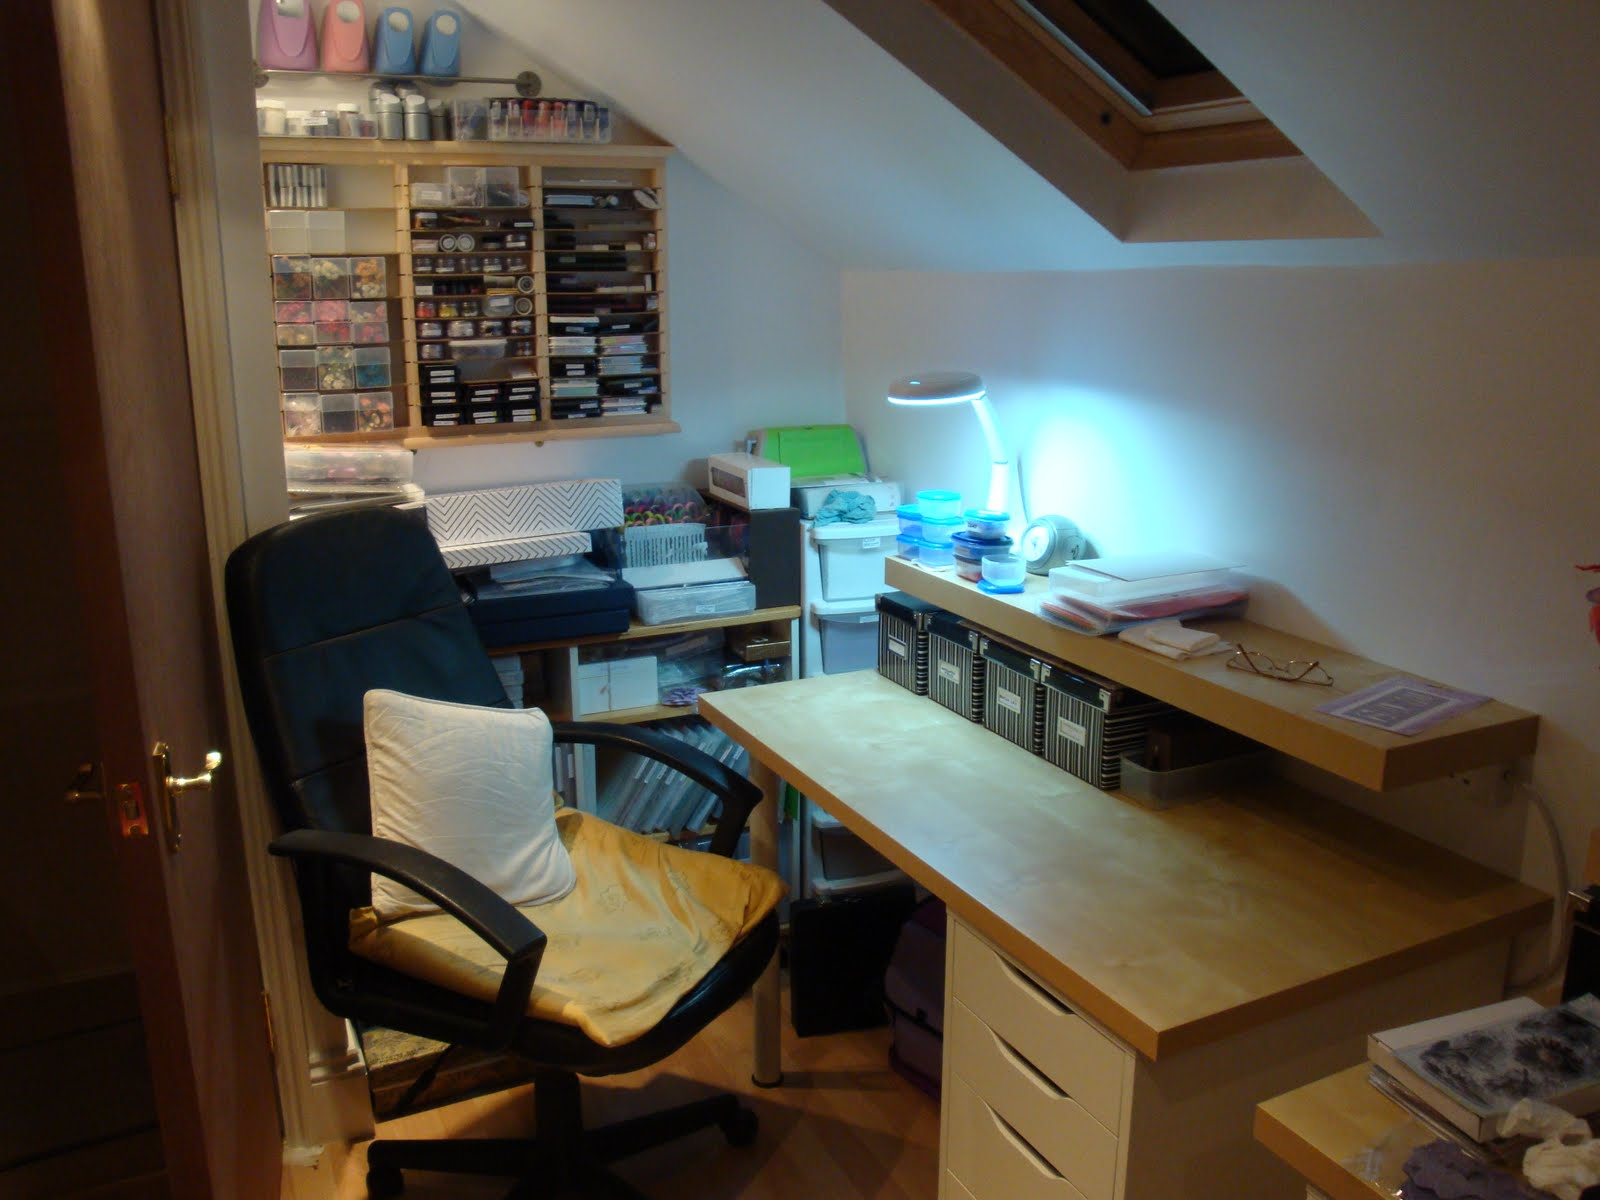 loft conversion office ideas - Loft Conversions Interior Design Ideas for Home fices